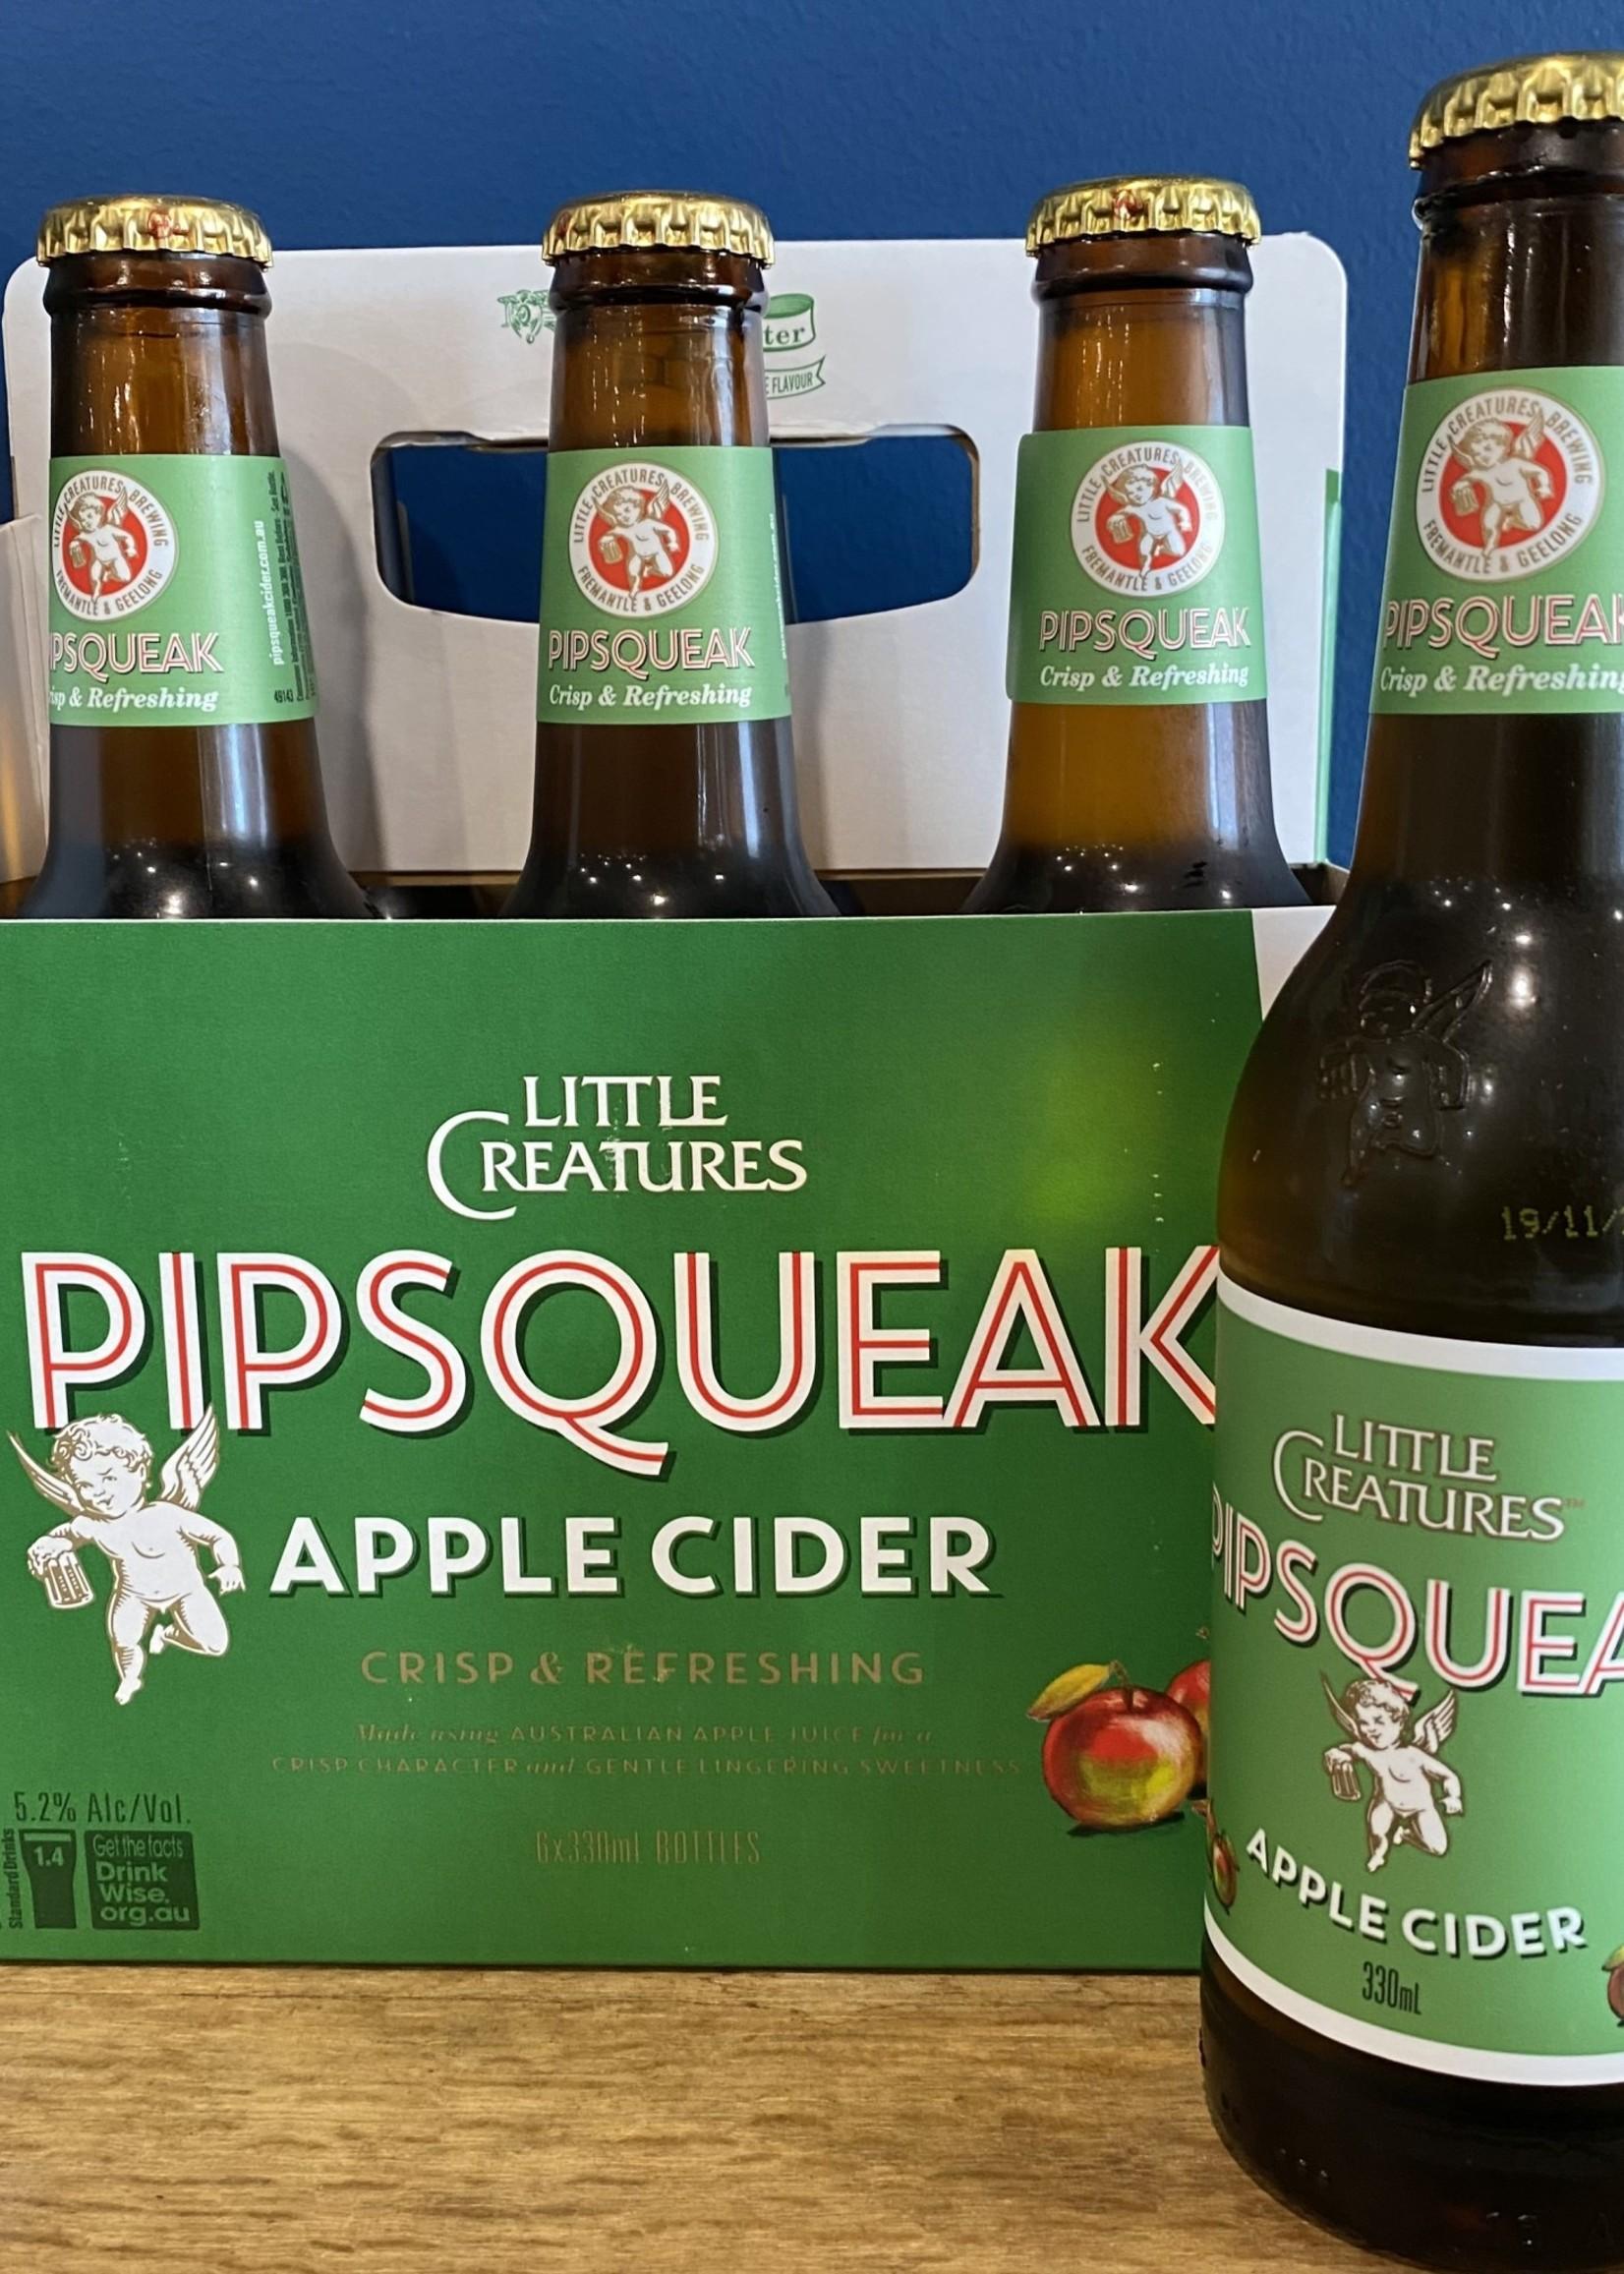 Little Creatures Pipsqueak Apple Cider